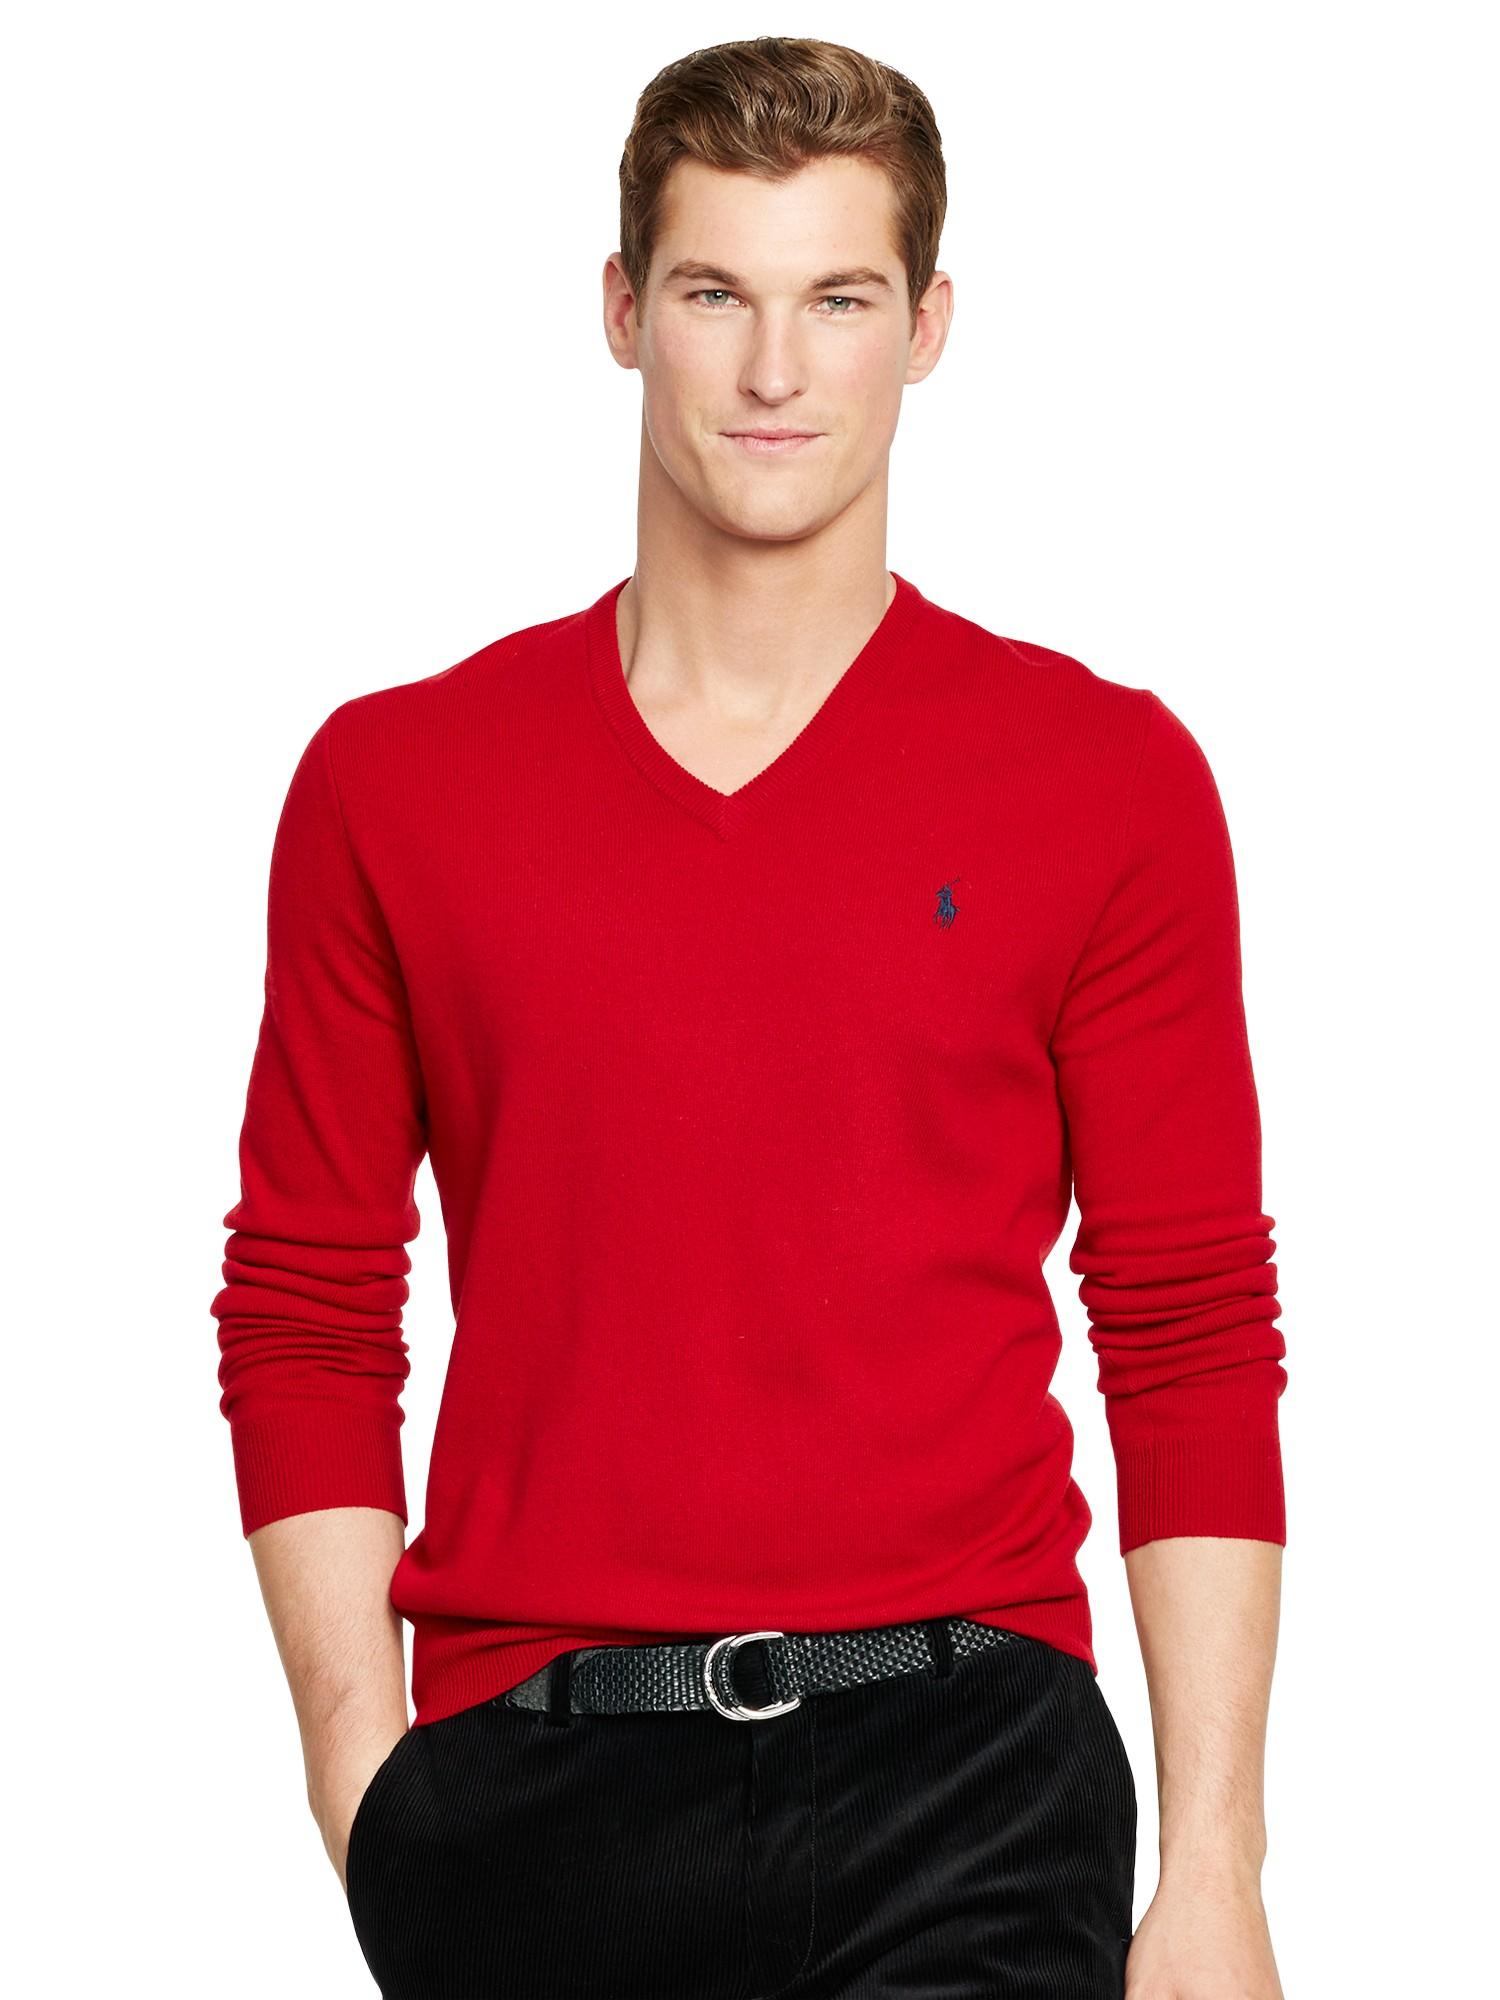 Ralph Lauren Fashion Show At New York: Polo Ralph Lauren Merino Wool V-neck Jumper In Red For Men